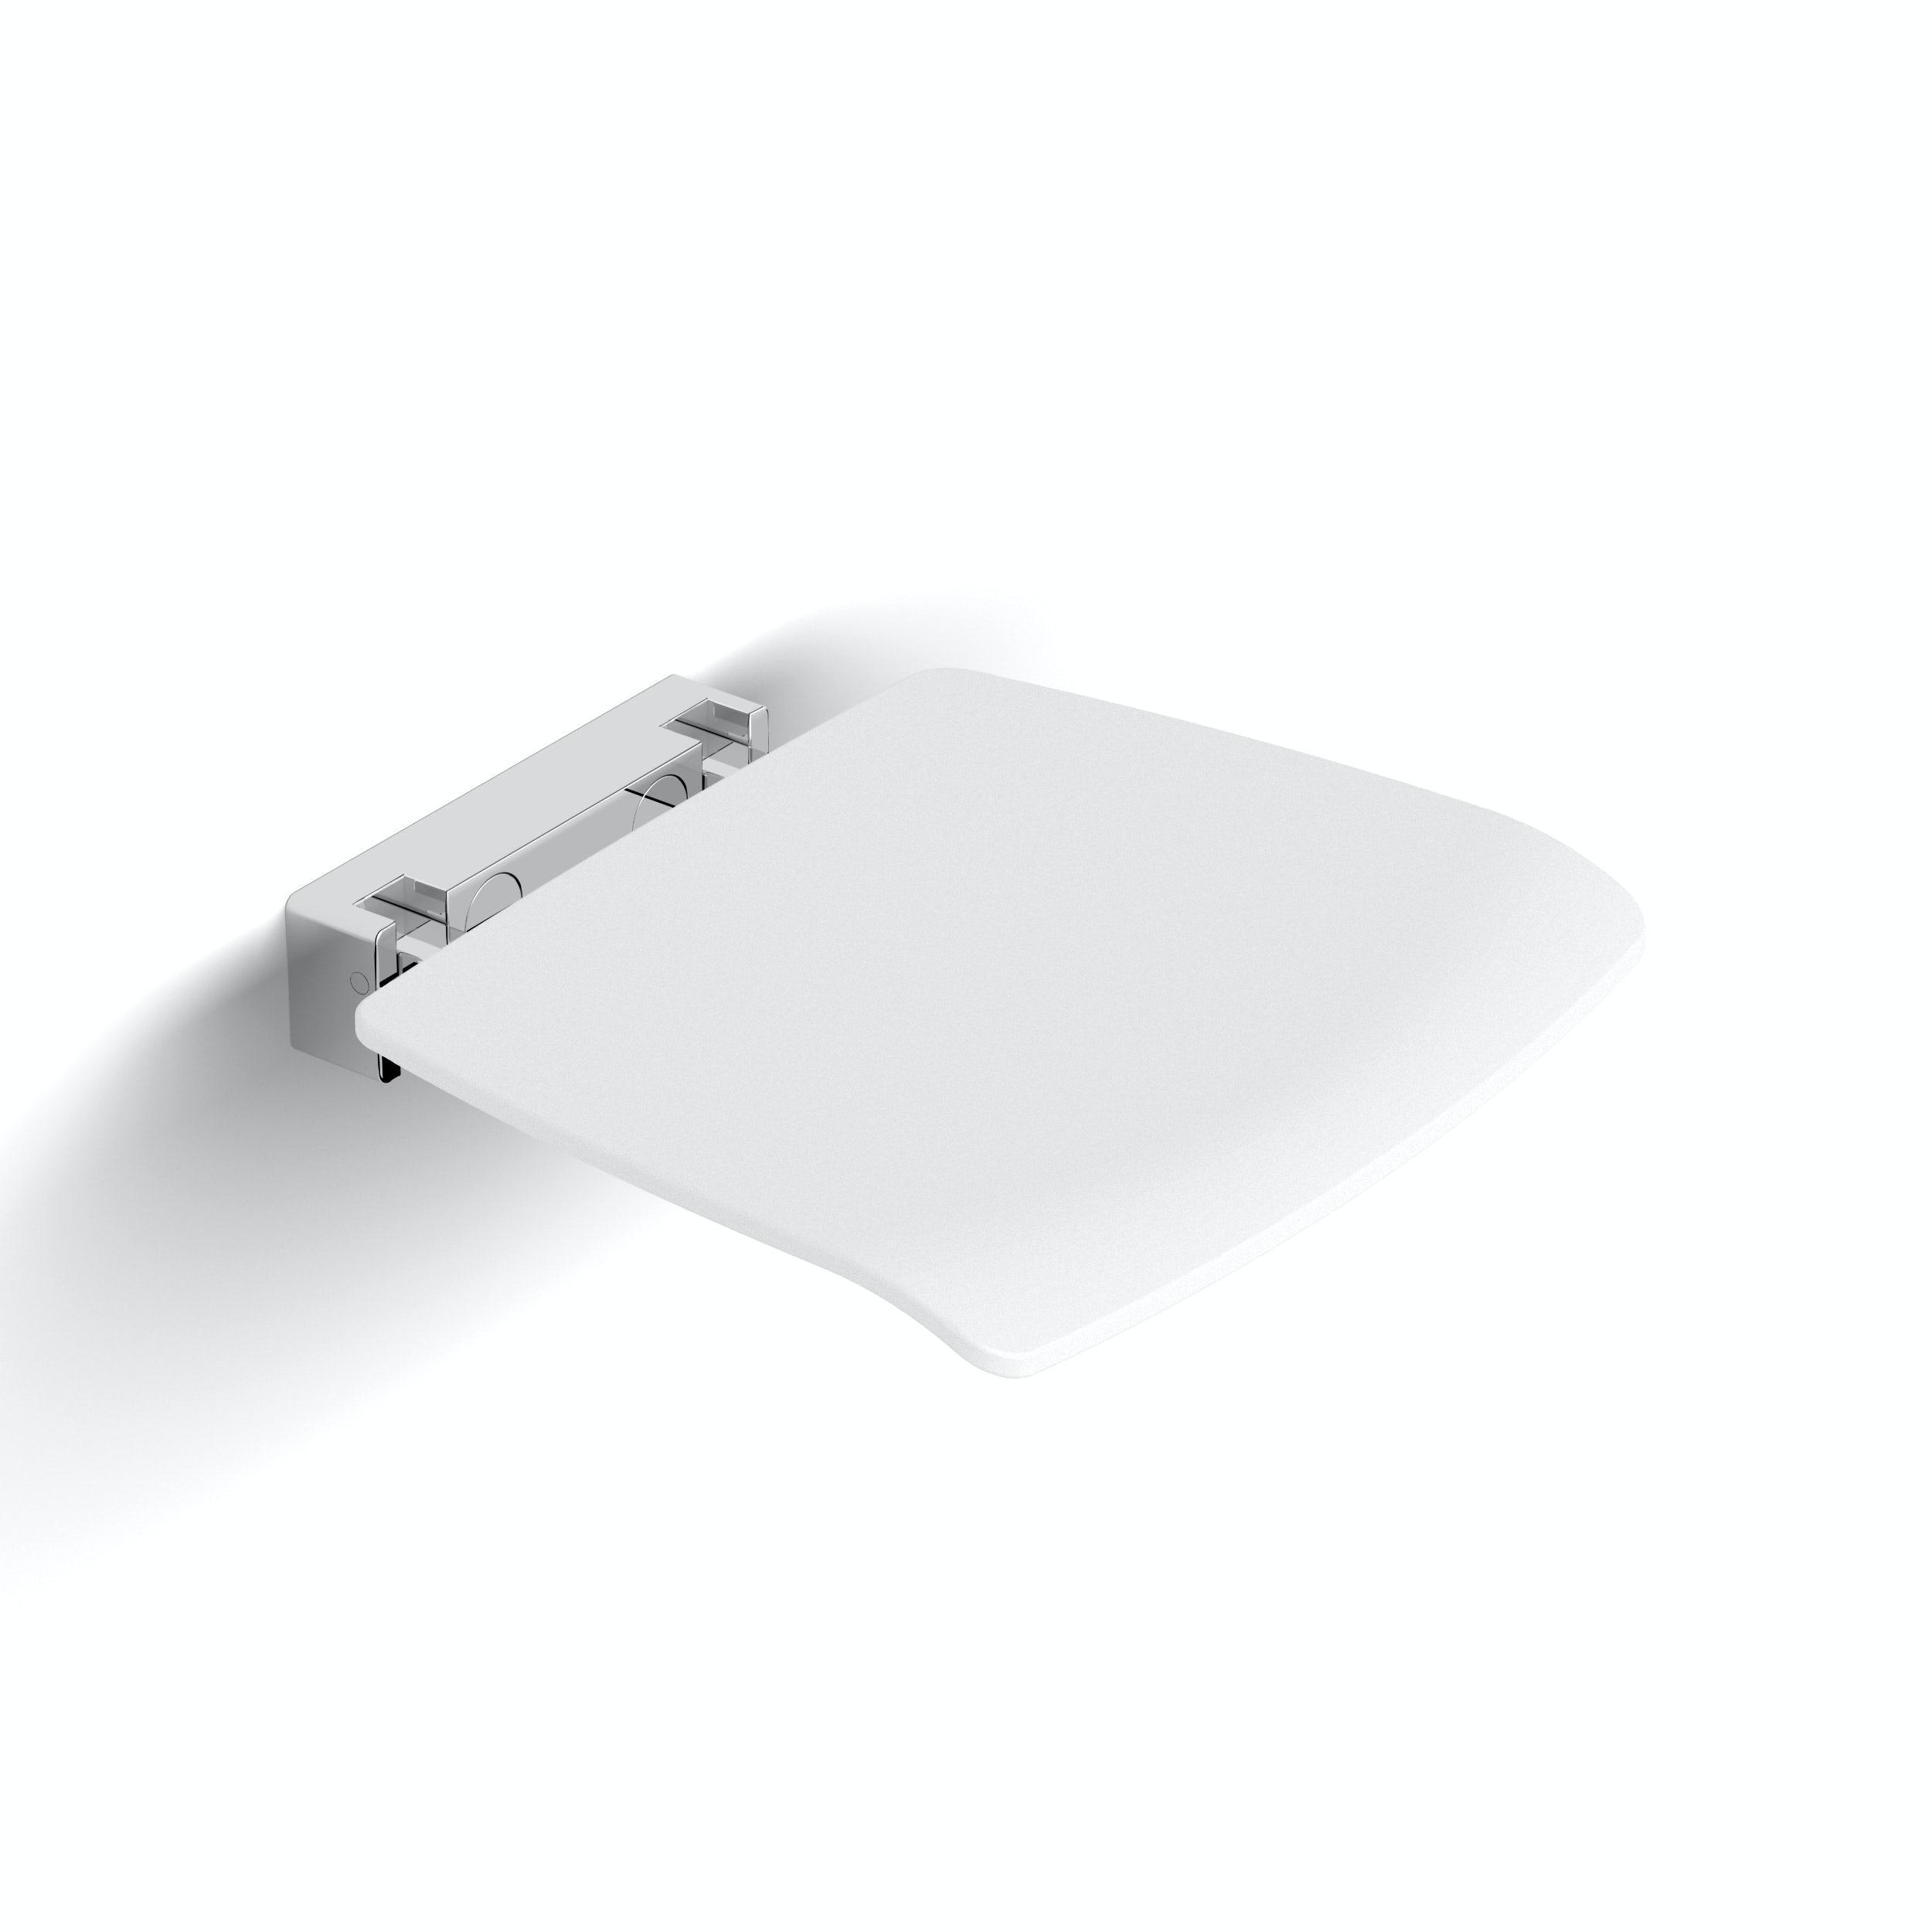 AKW Velena Devote shower seat white - Sold by Victoria Plum